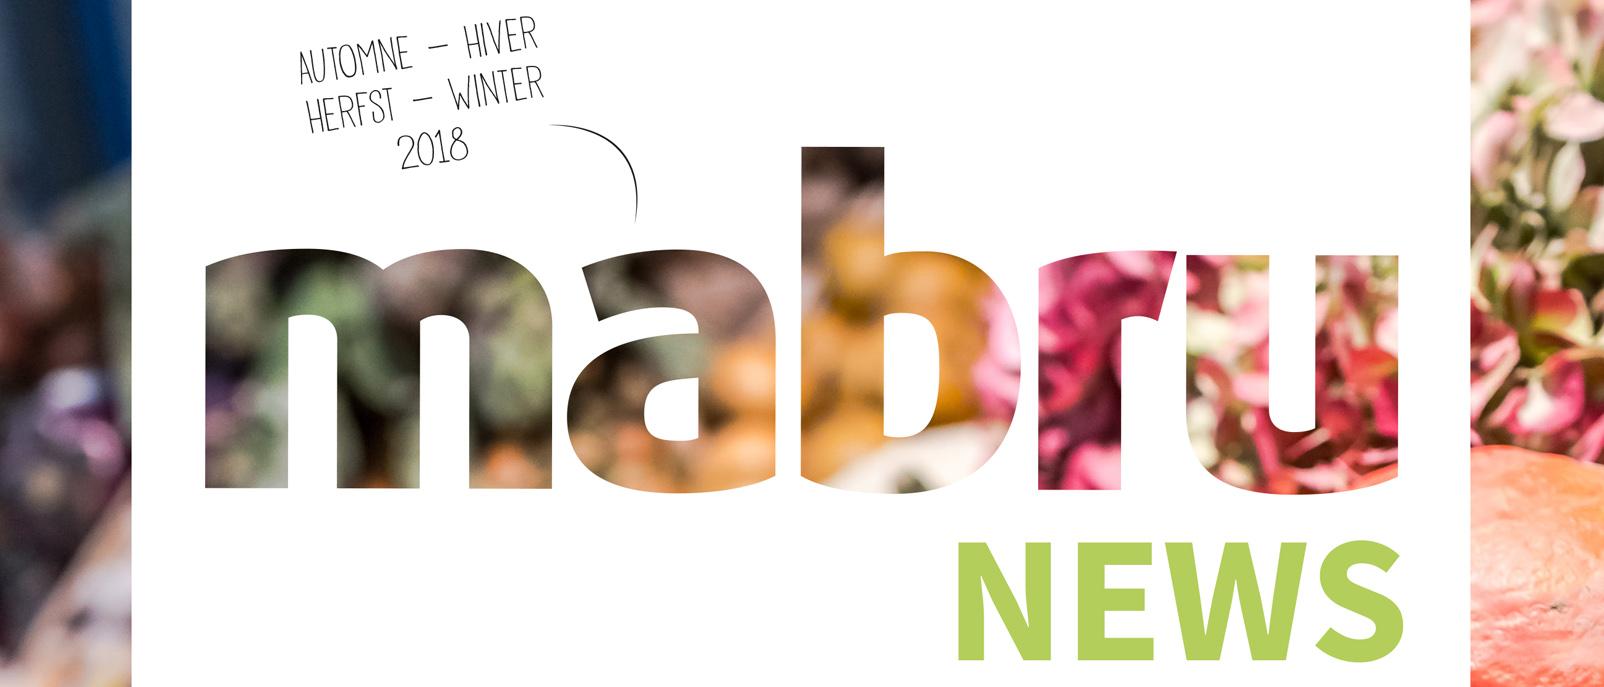 Le Mabru News Automne-Hiver 2018 est sorti